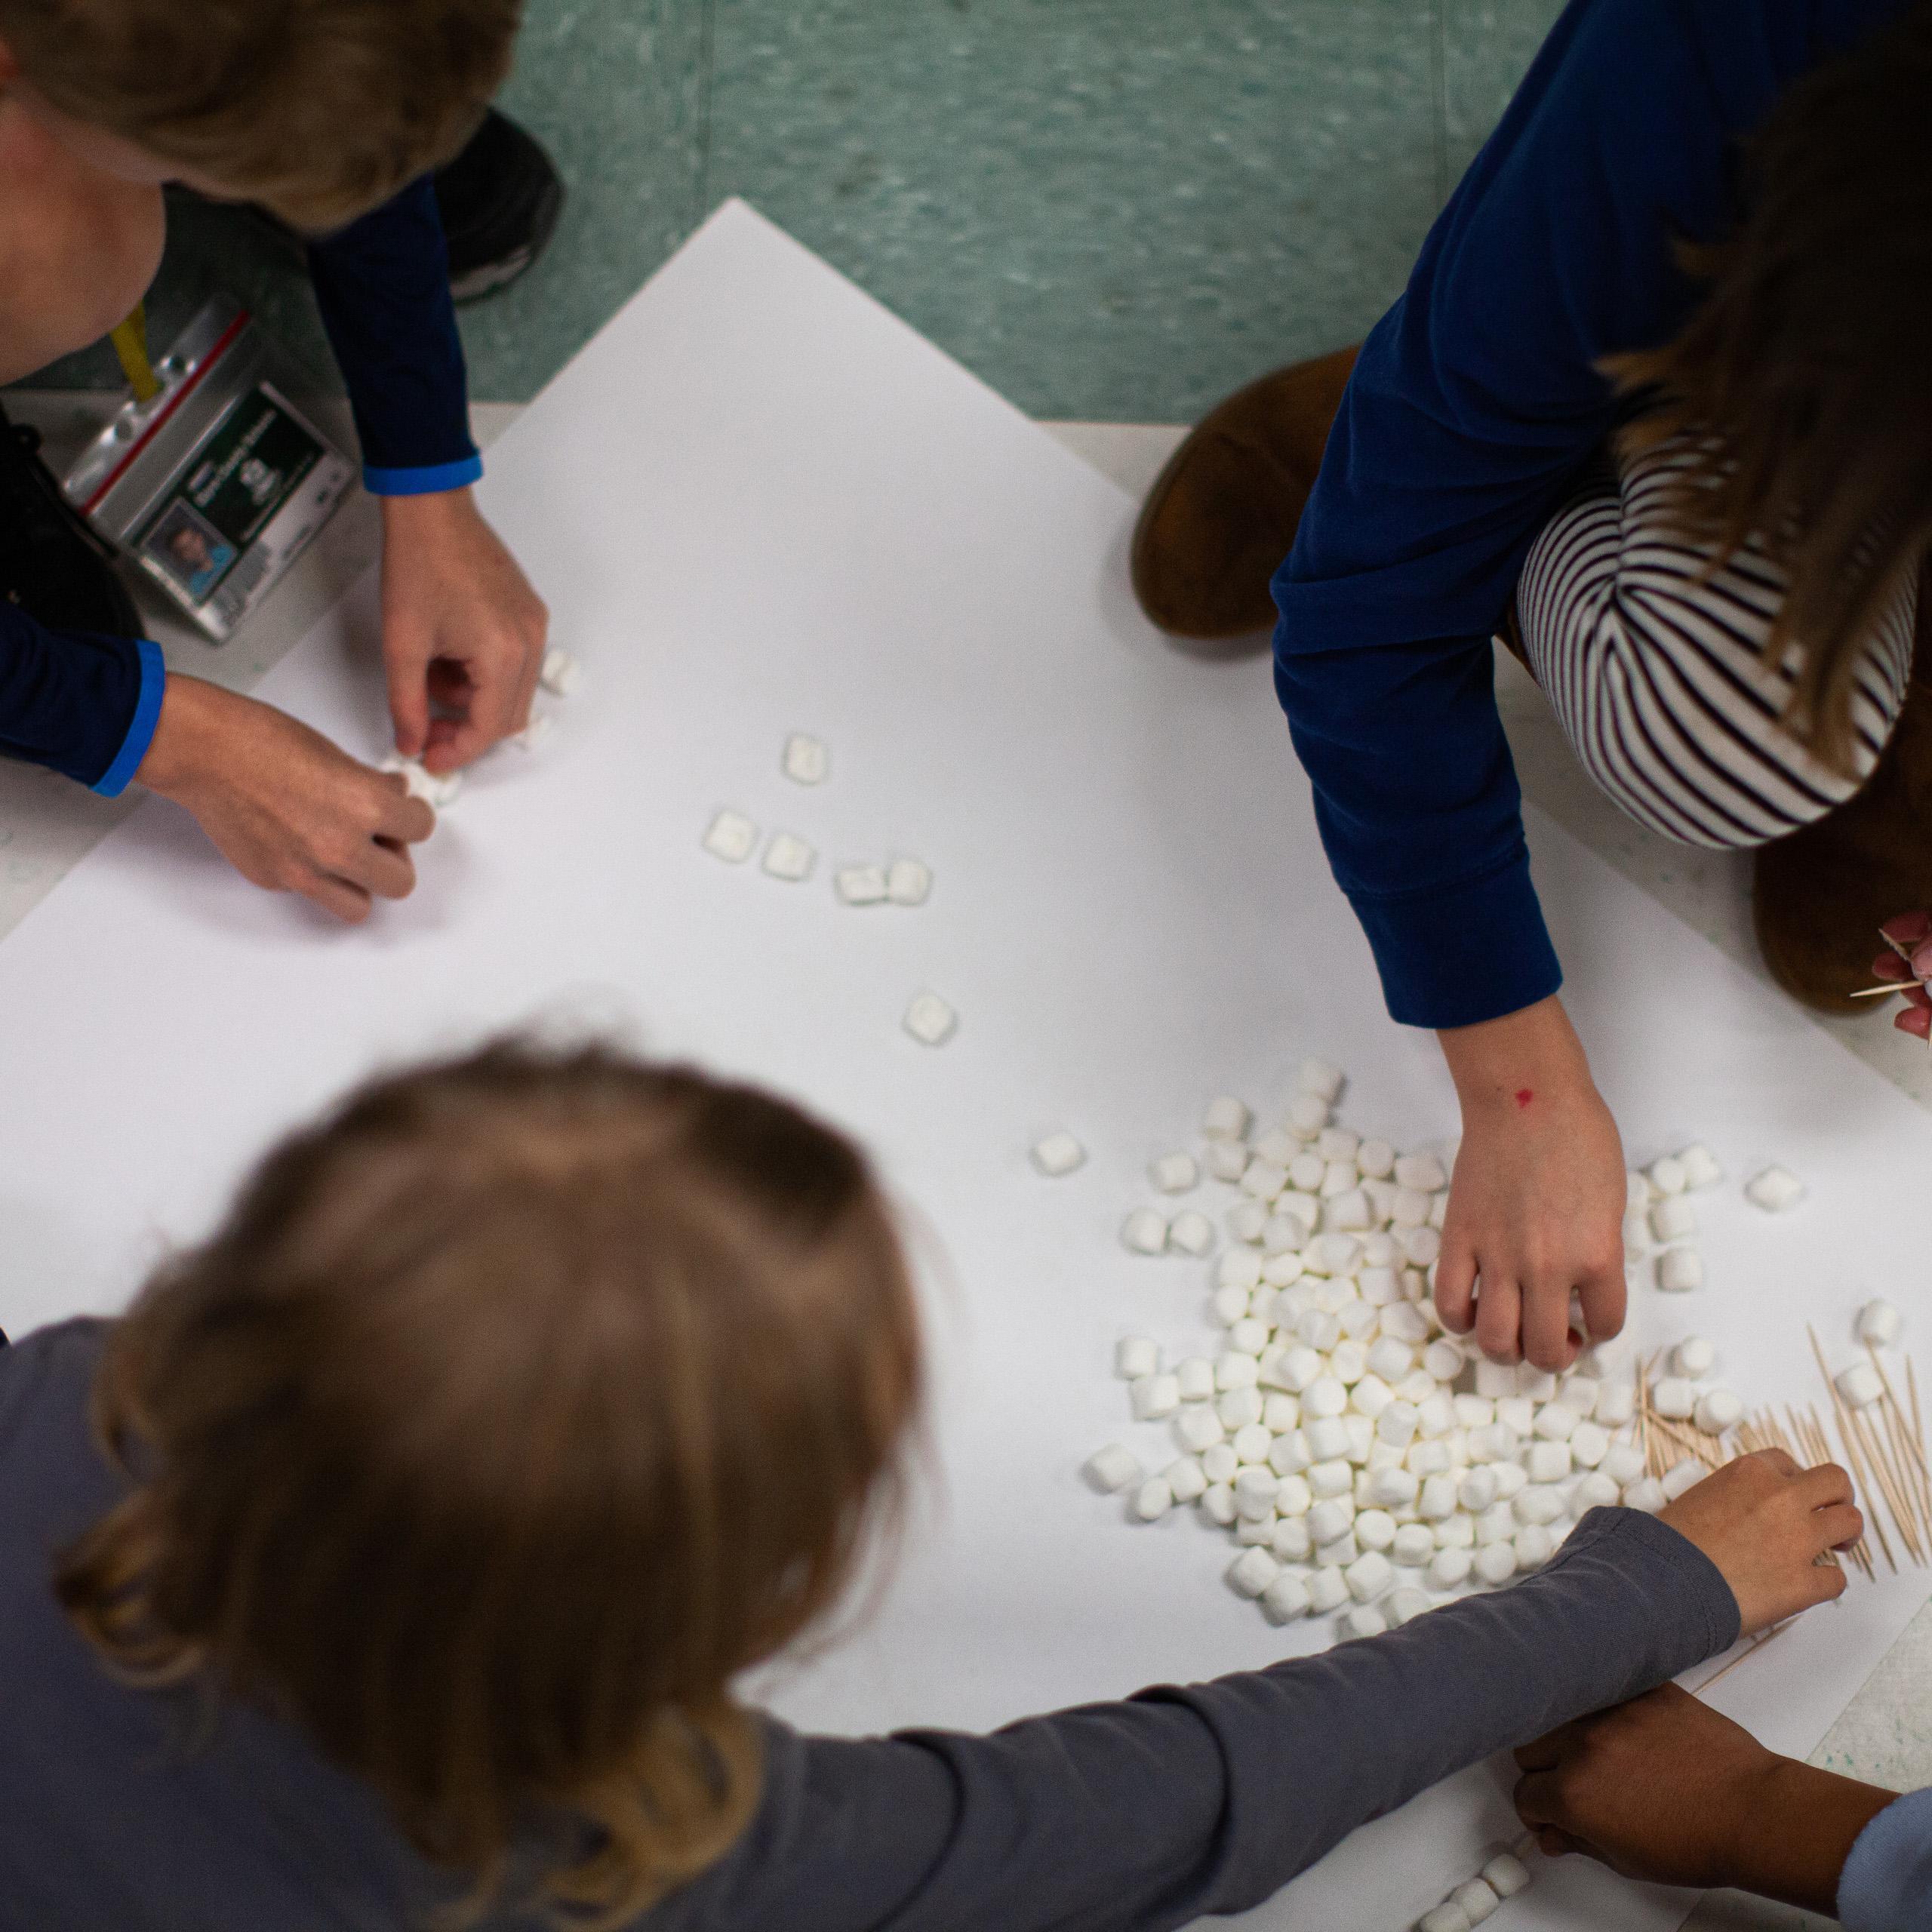 students organize math manipulatives